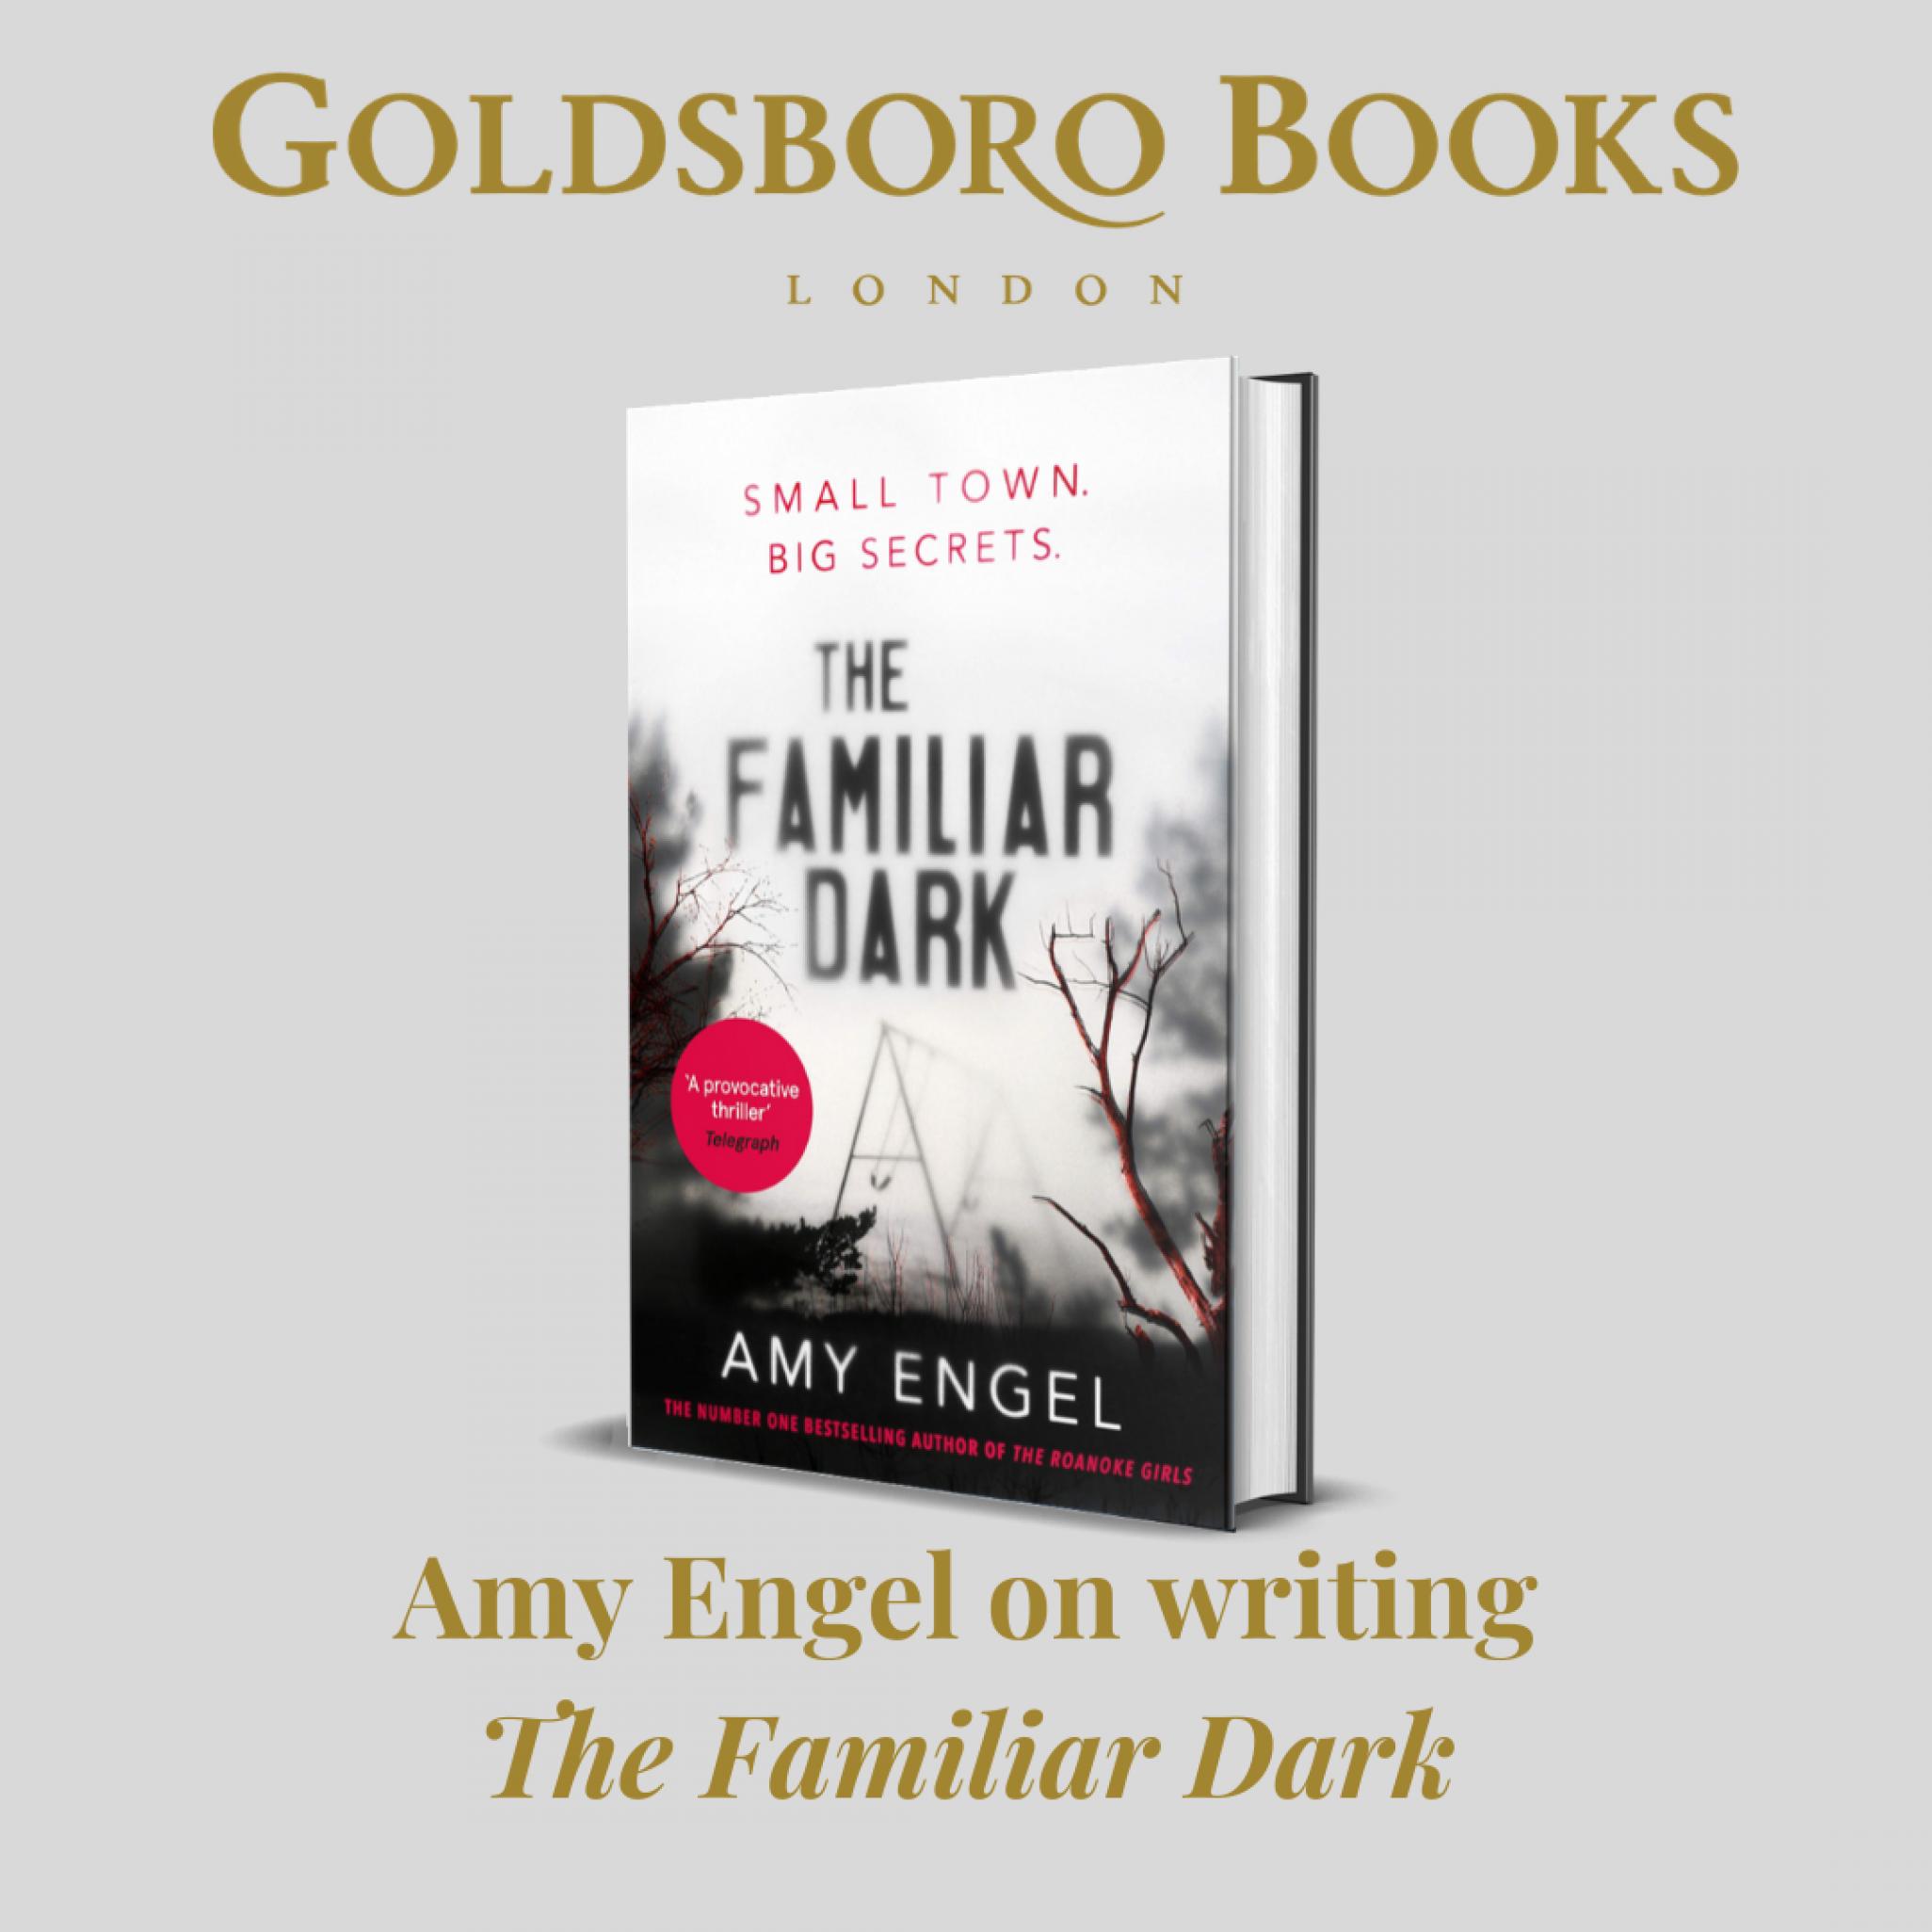 Writing 'The Familiar Dark'